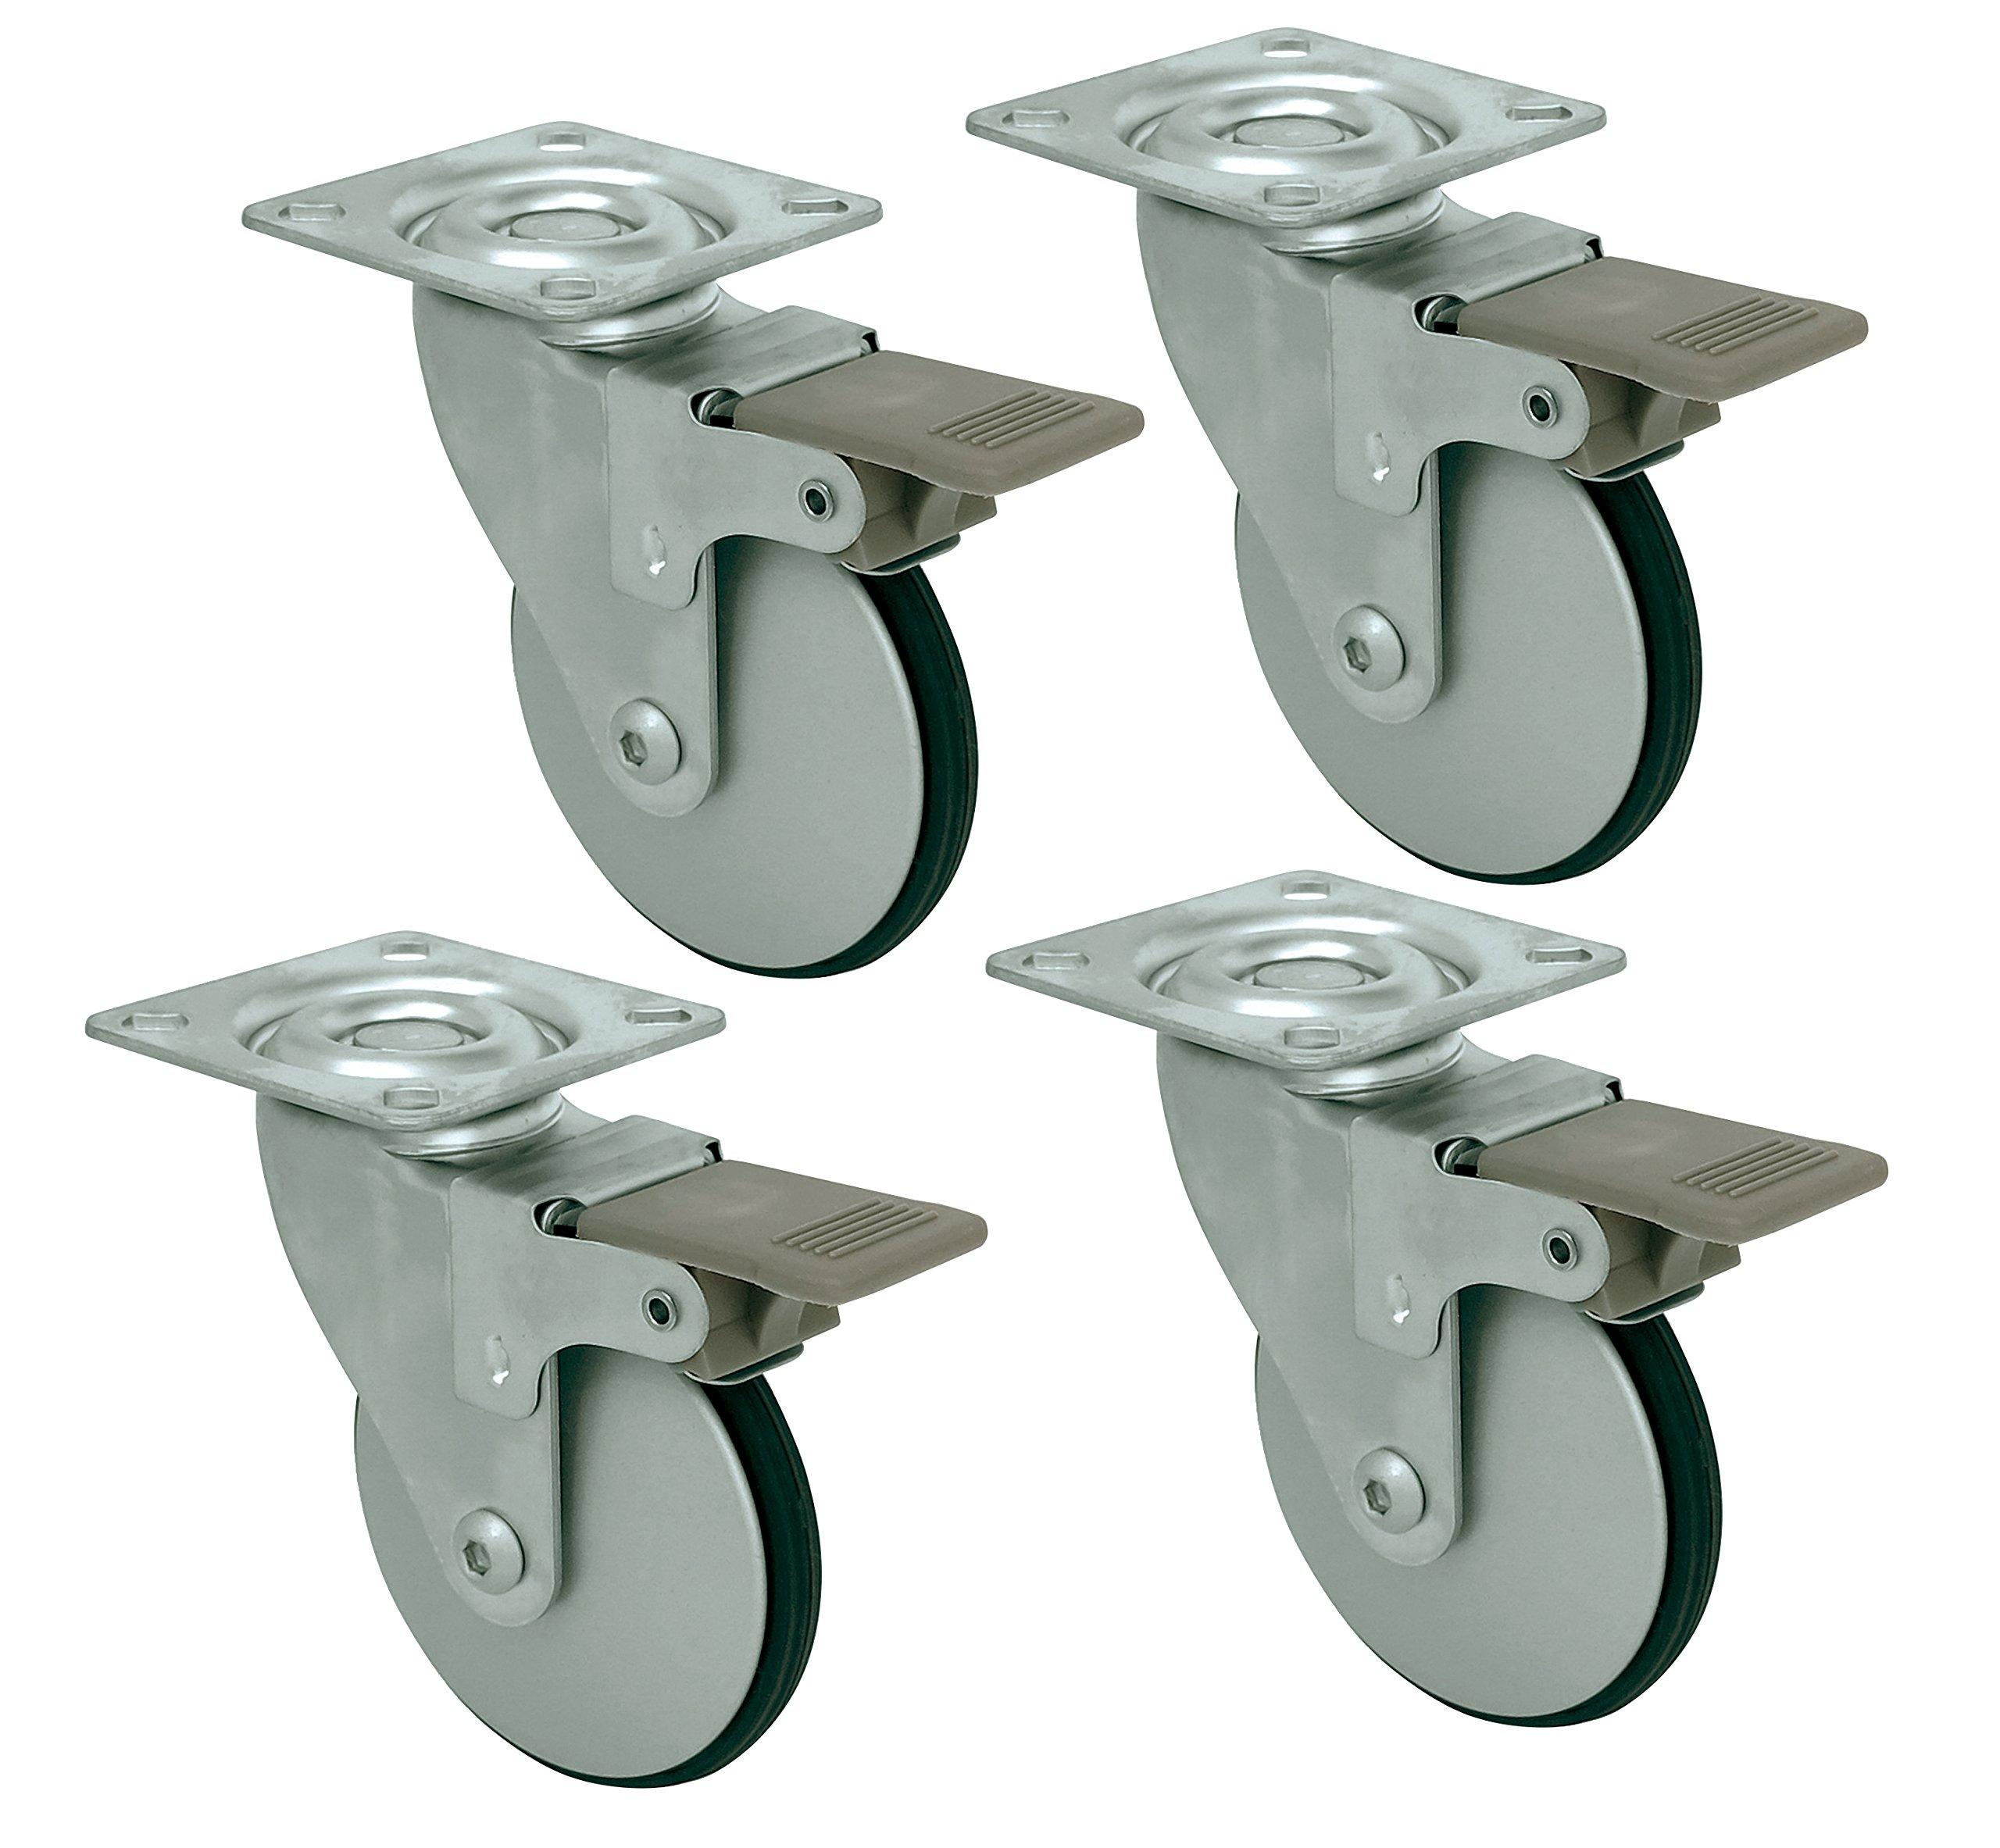 Headbourne 8289E Designer Casters 3 inch Aluminum Designer Caster with Polyethylene Tread, 4 Pack